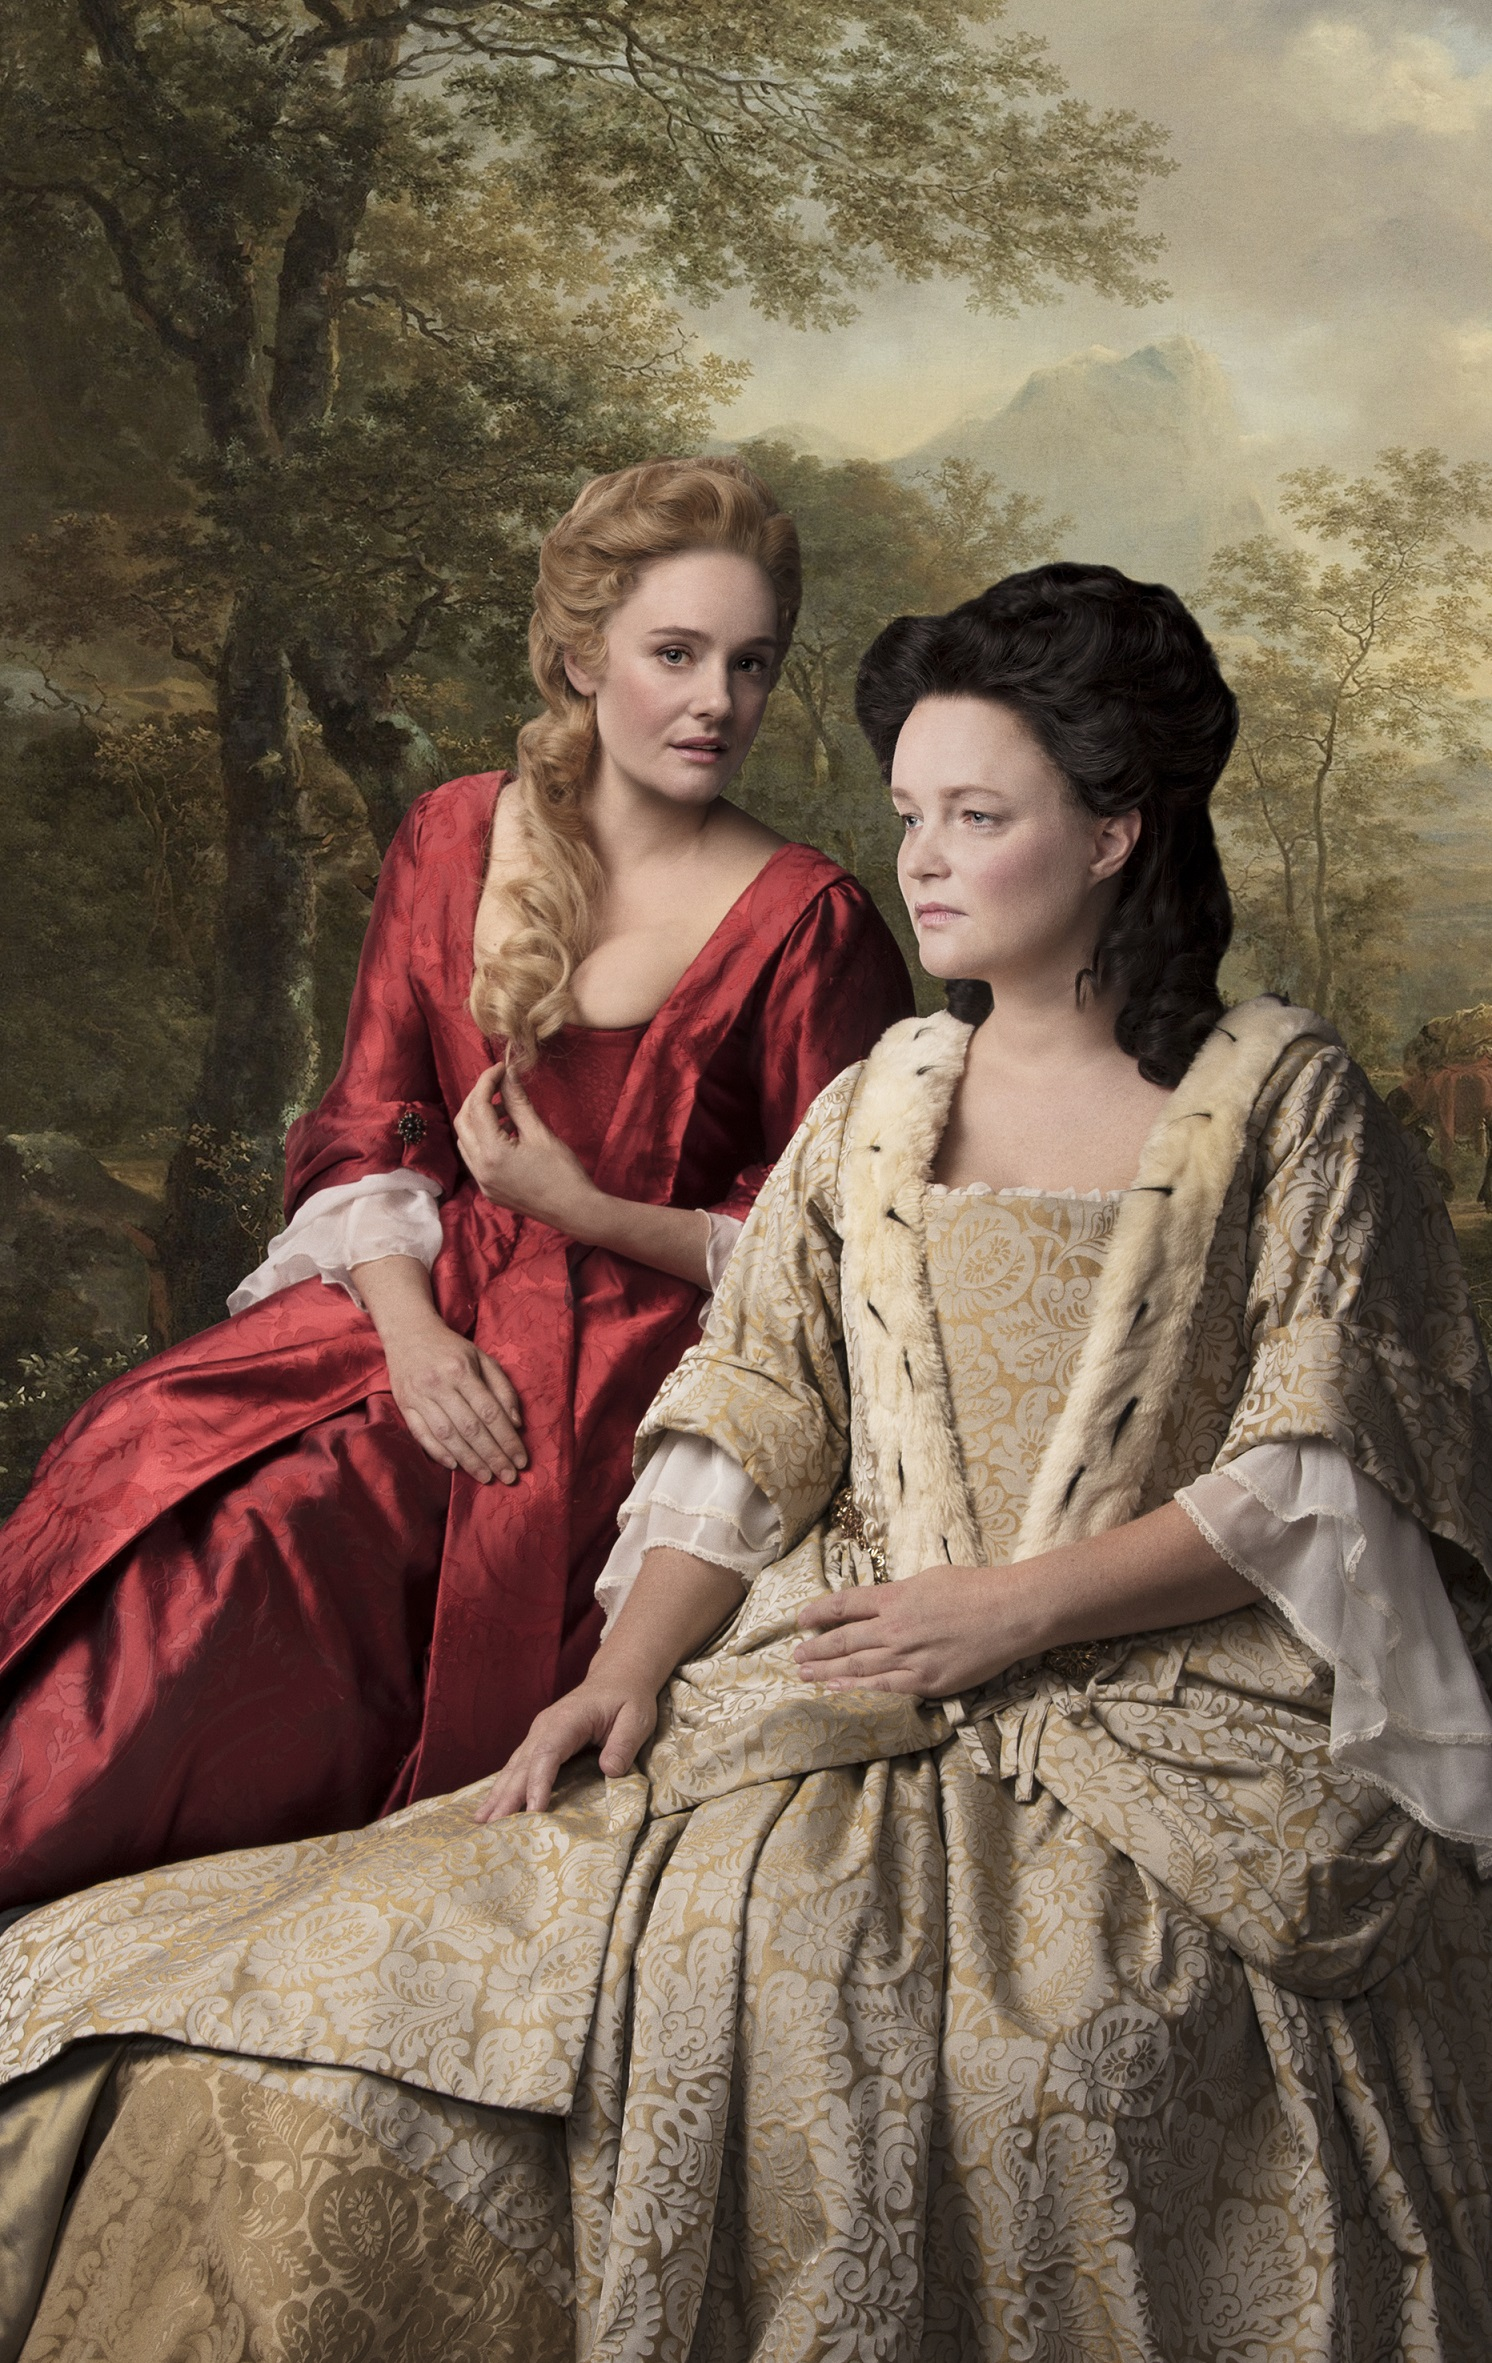 romola-garai-sarah-duchess-of-malborough-and-emma-cunniffe-queen-anne-in-queen-anne-credit-darren-bell-jpg